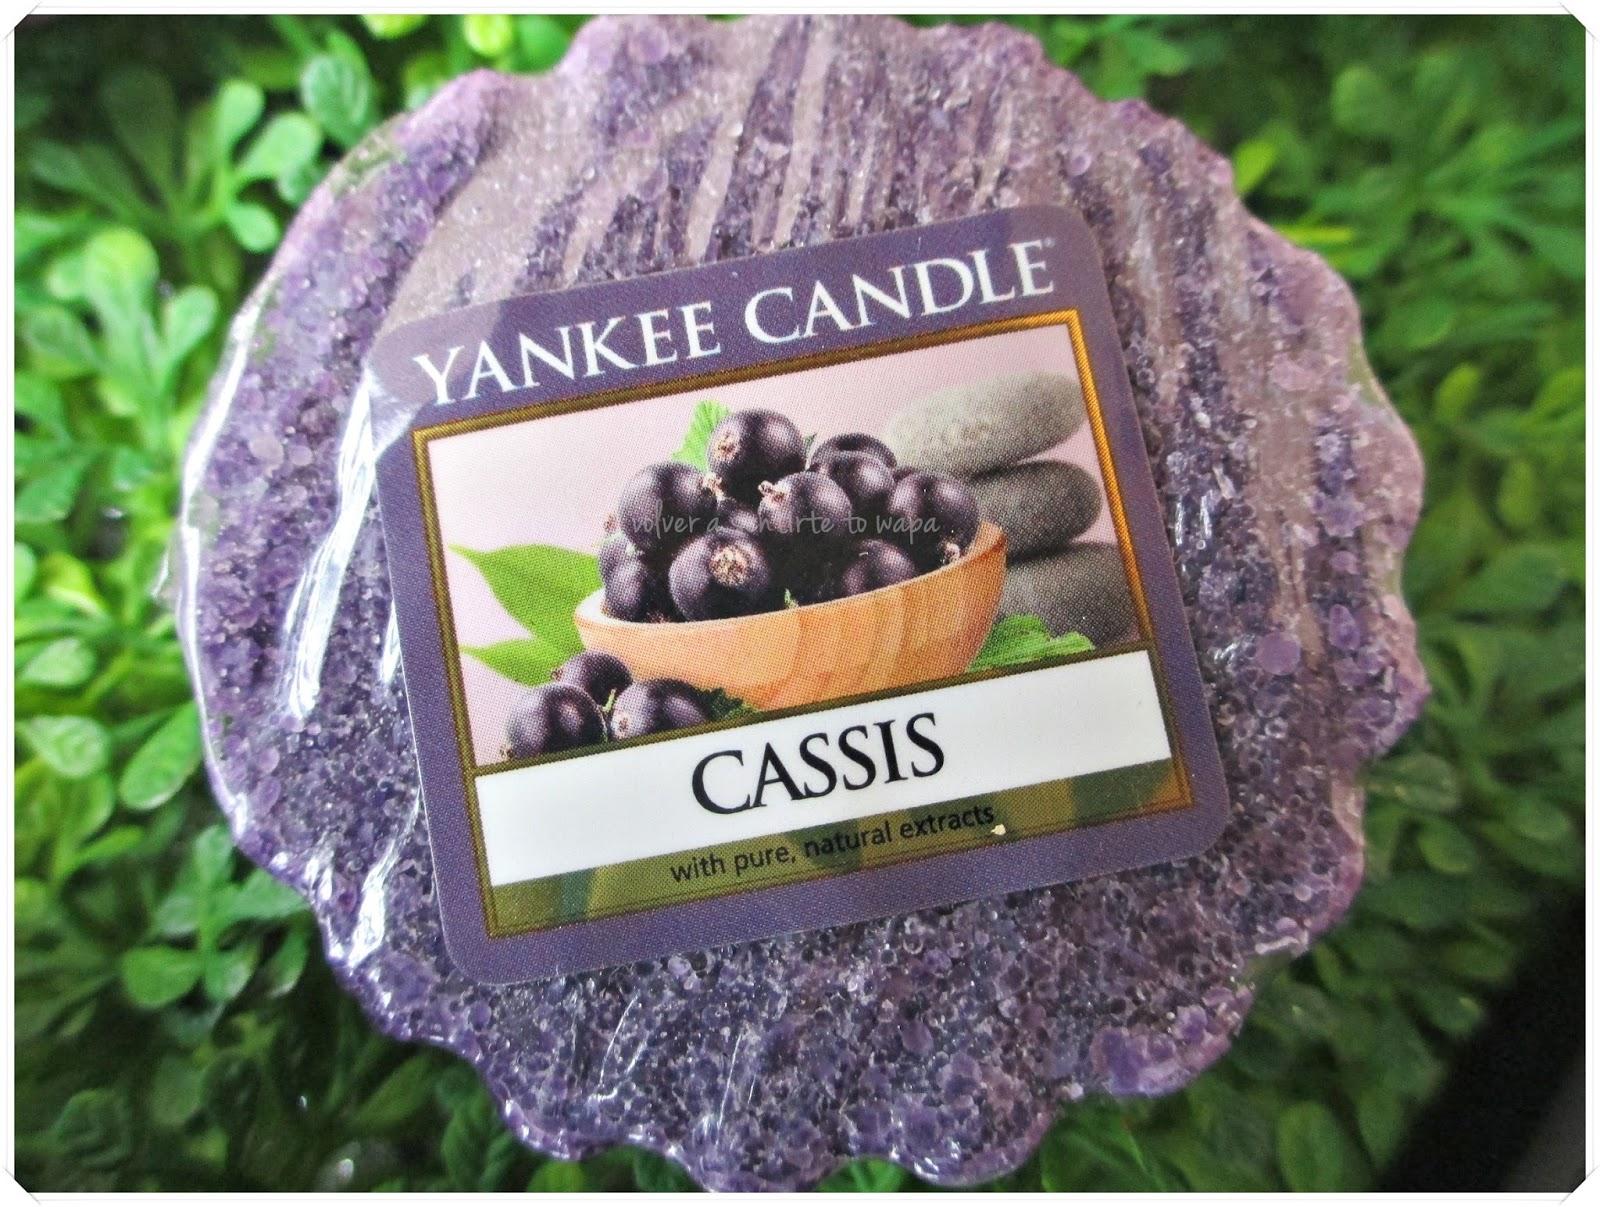 tarts de Yankee Candle - Cassis